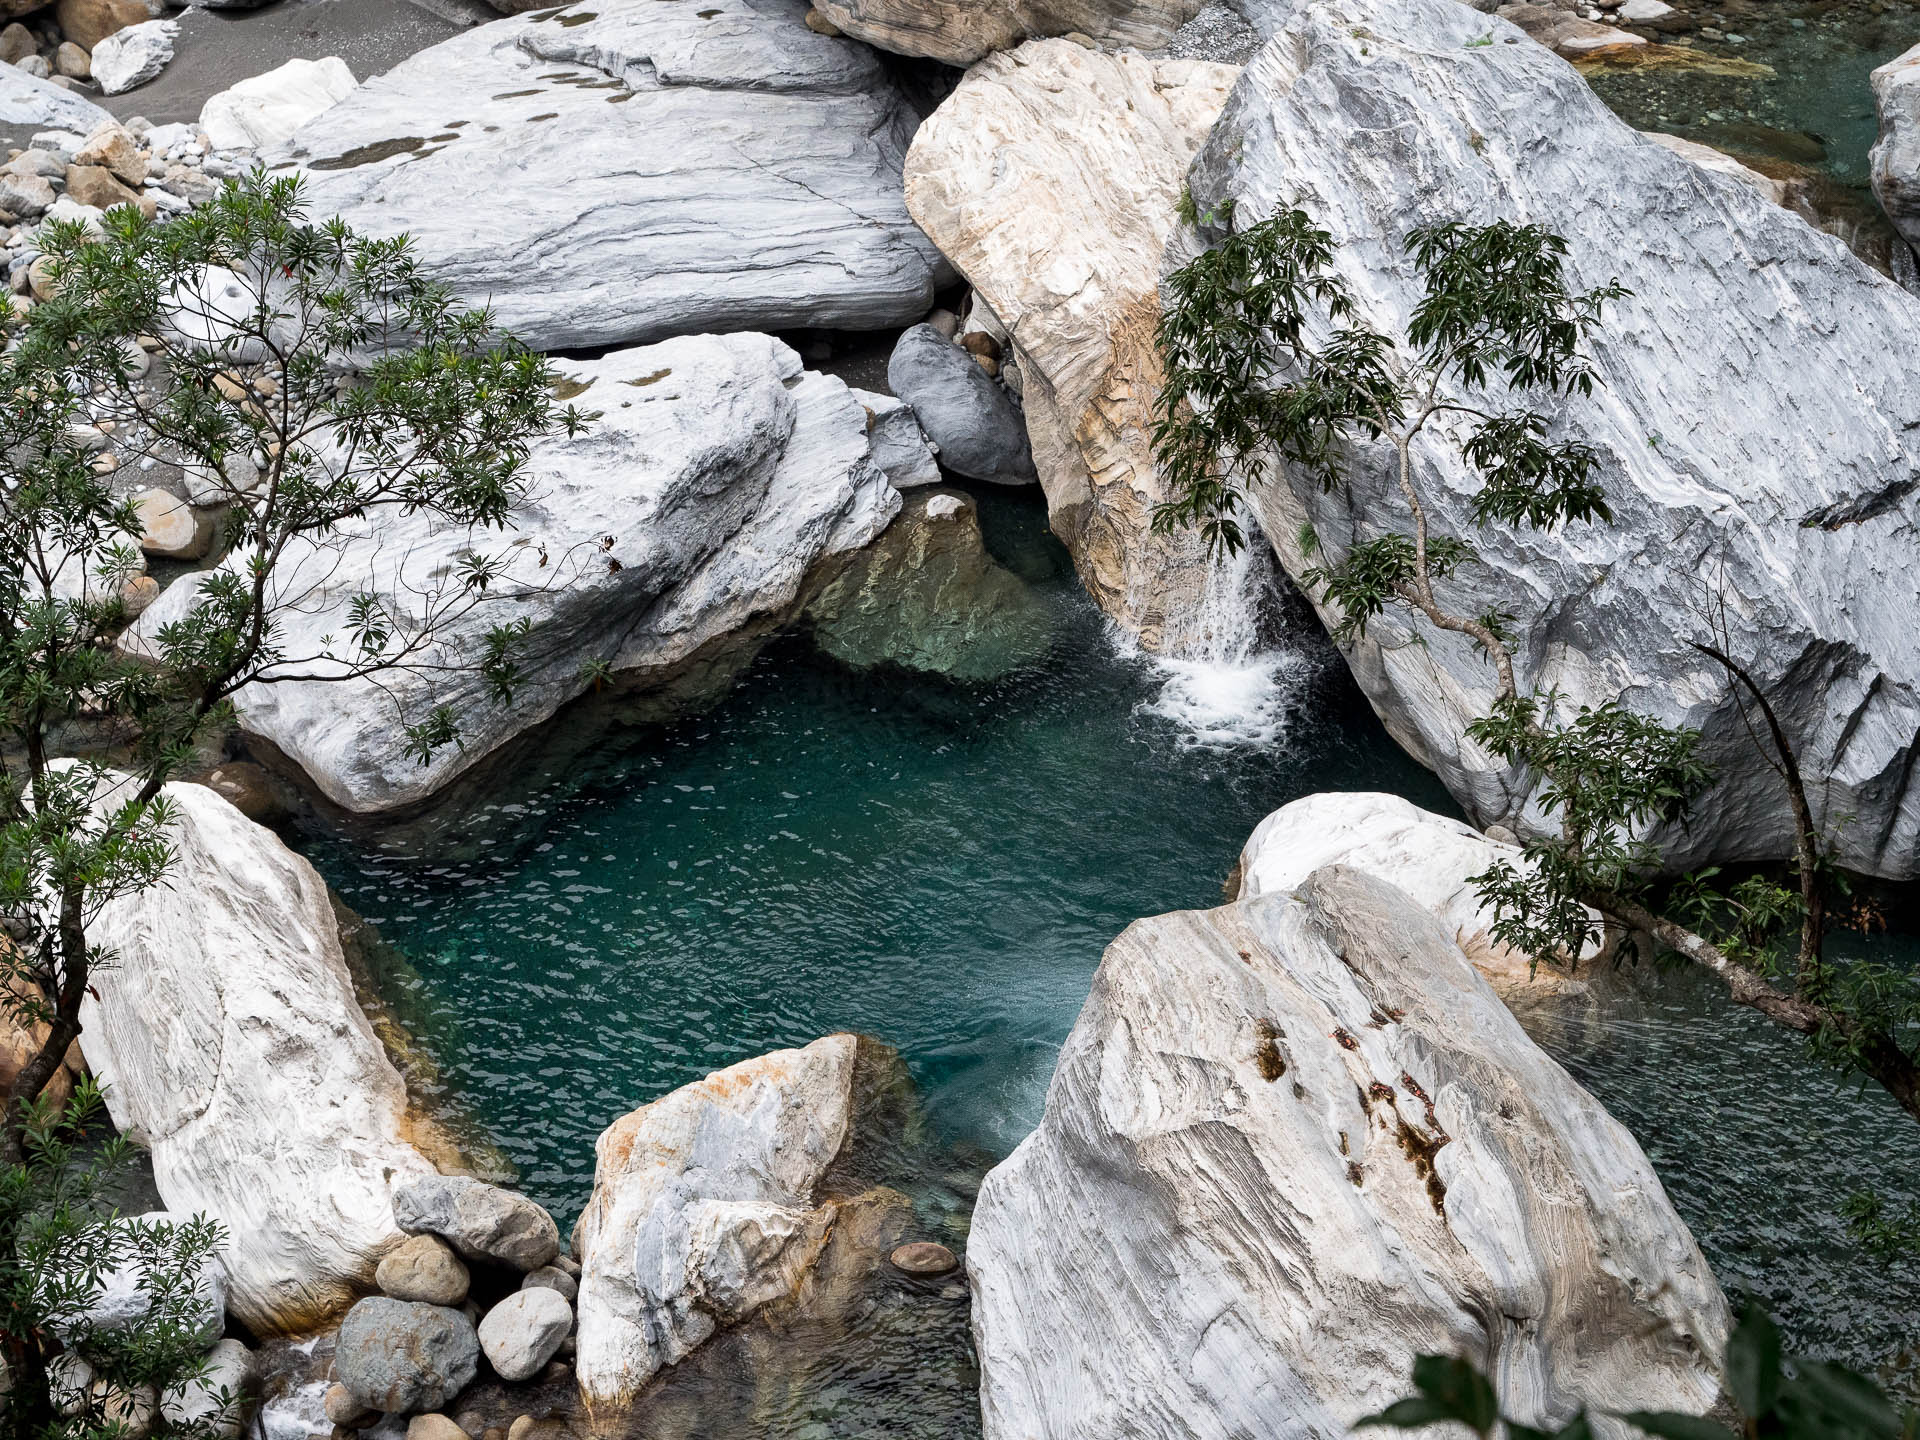 taroko piscine - Les globe blogueurs - blog voyage nature